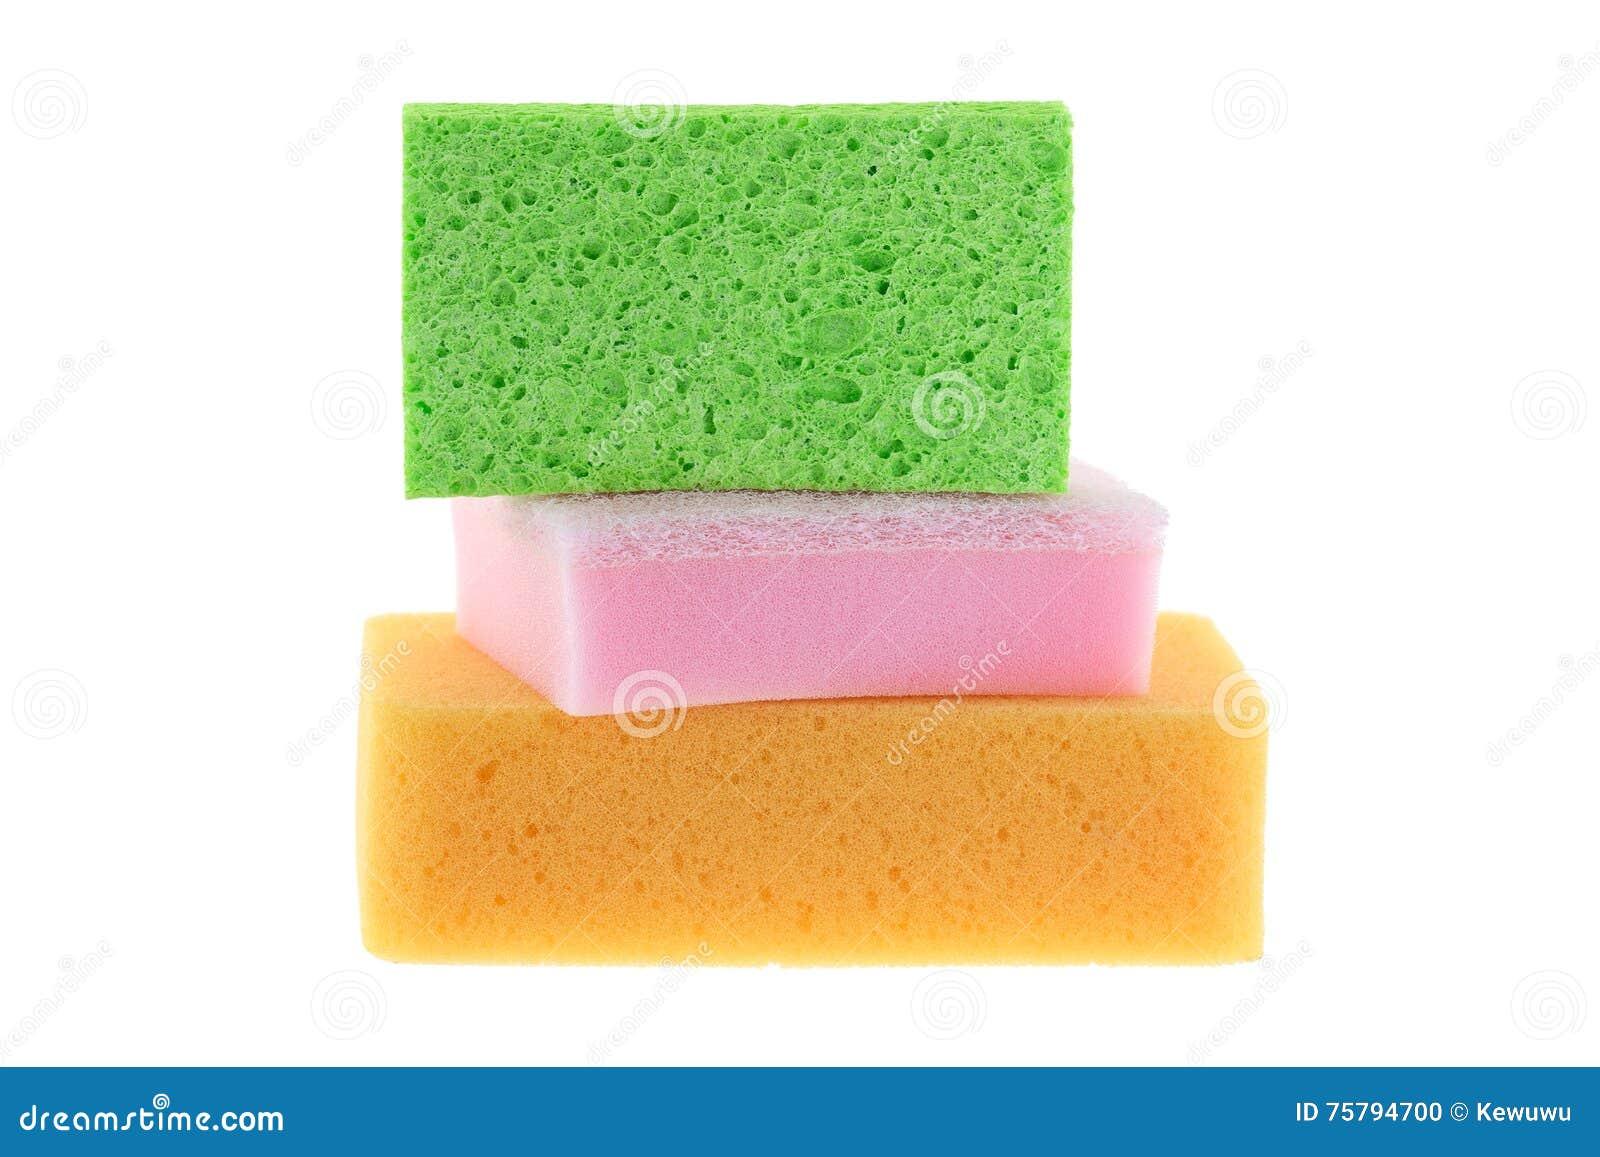 Cellulose sponge, dish washing sponge with scrub and multi purpose sponge isolated on white